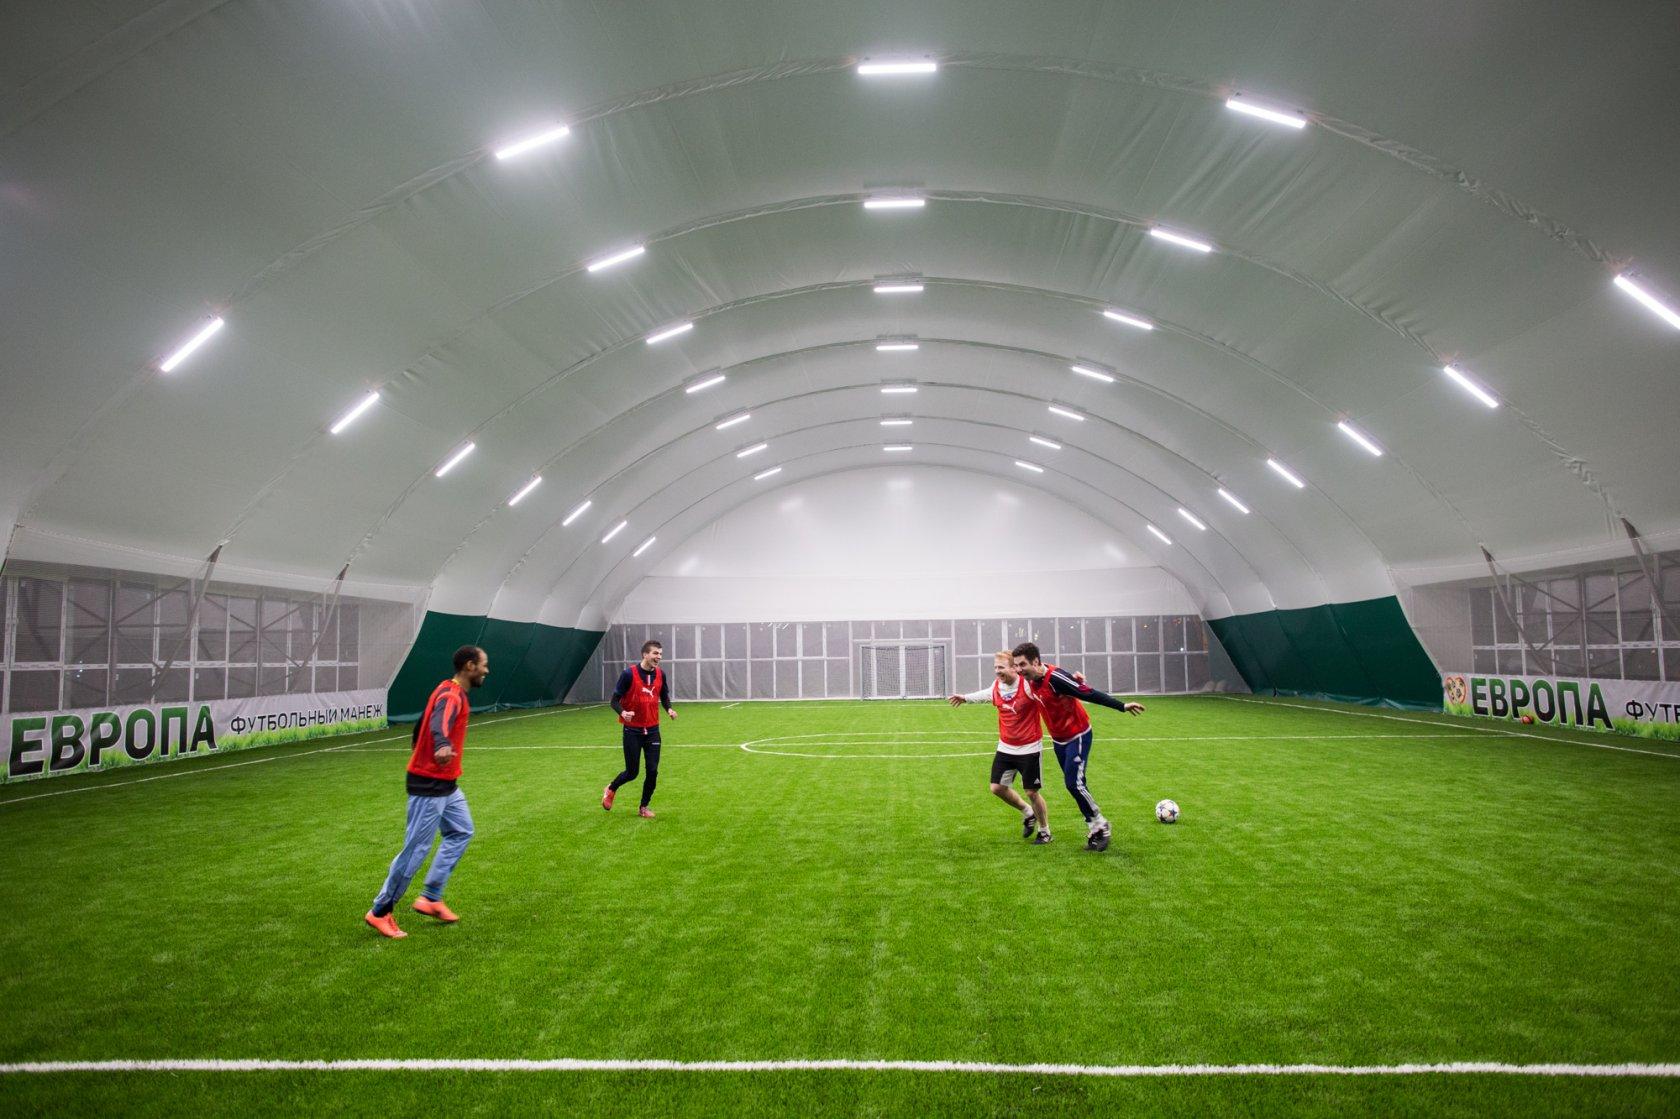 marketing plan football club Youth recreation marketing plan using comprehensive marketing mix by aaron marquis.